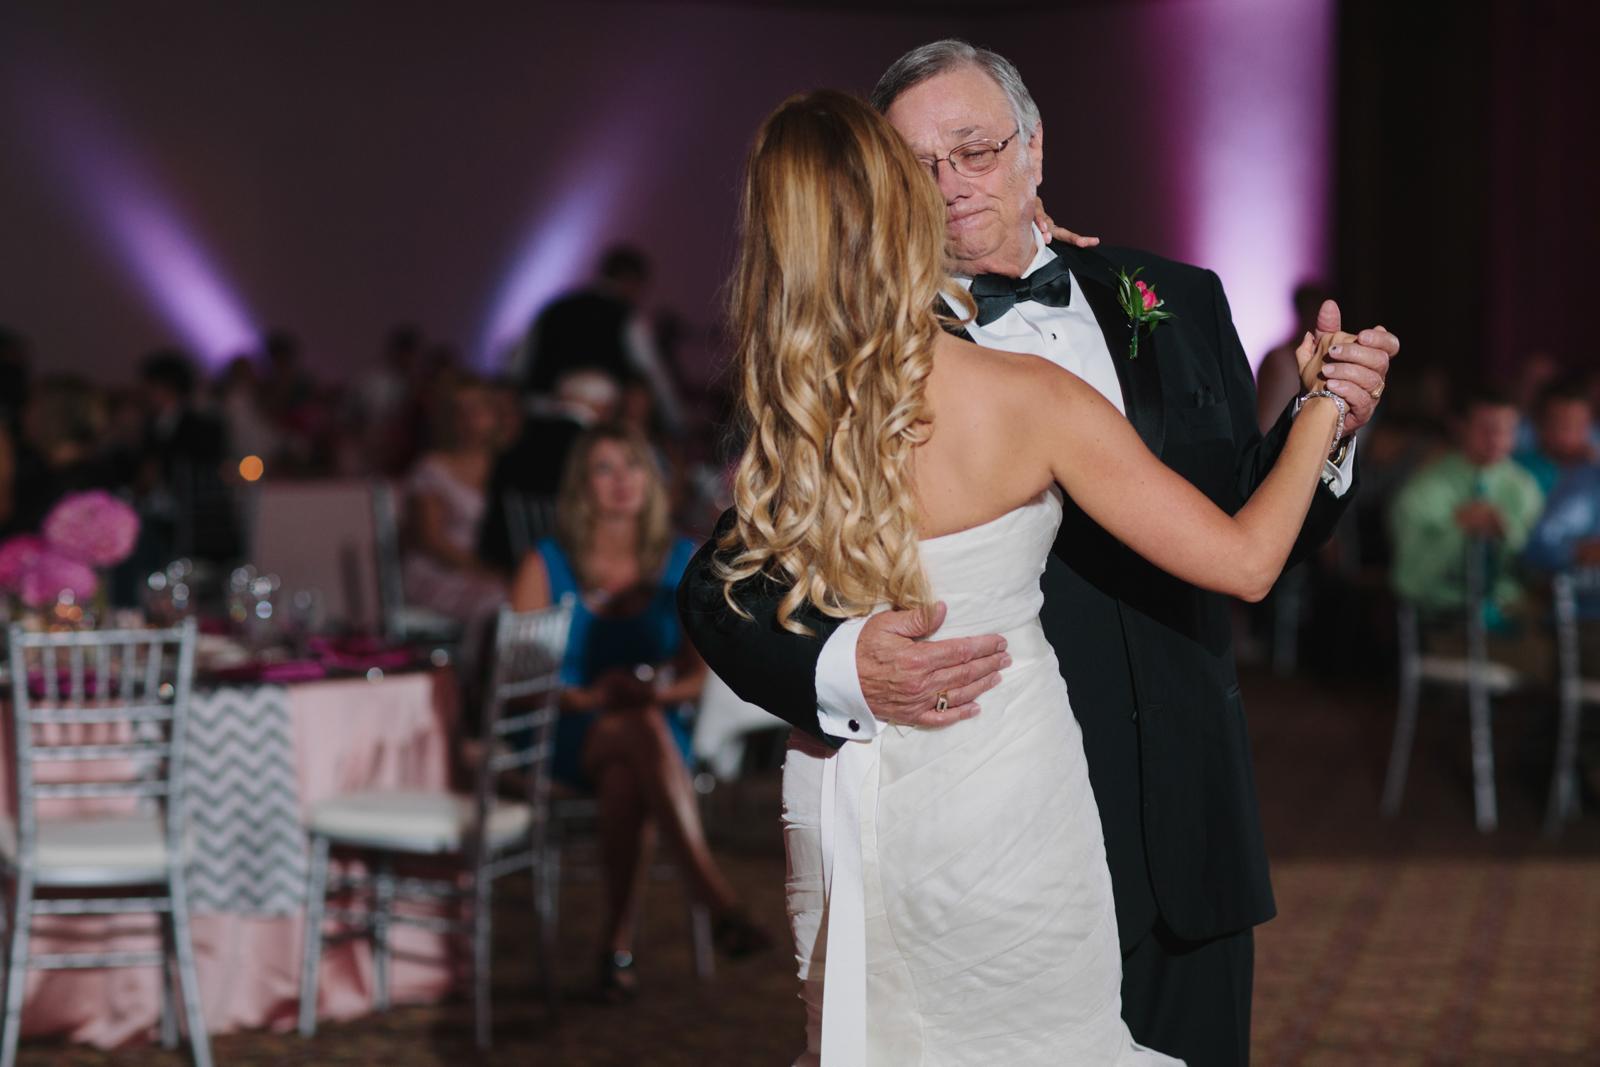 Northern Michigan Grand Traverse Resort Black Tie Wedding Photographer - Codee and Aaron-020.jpg